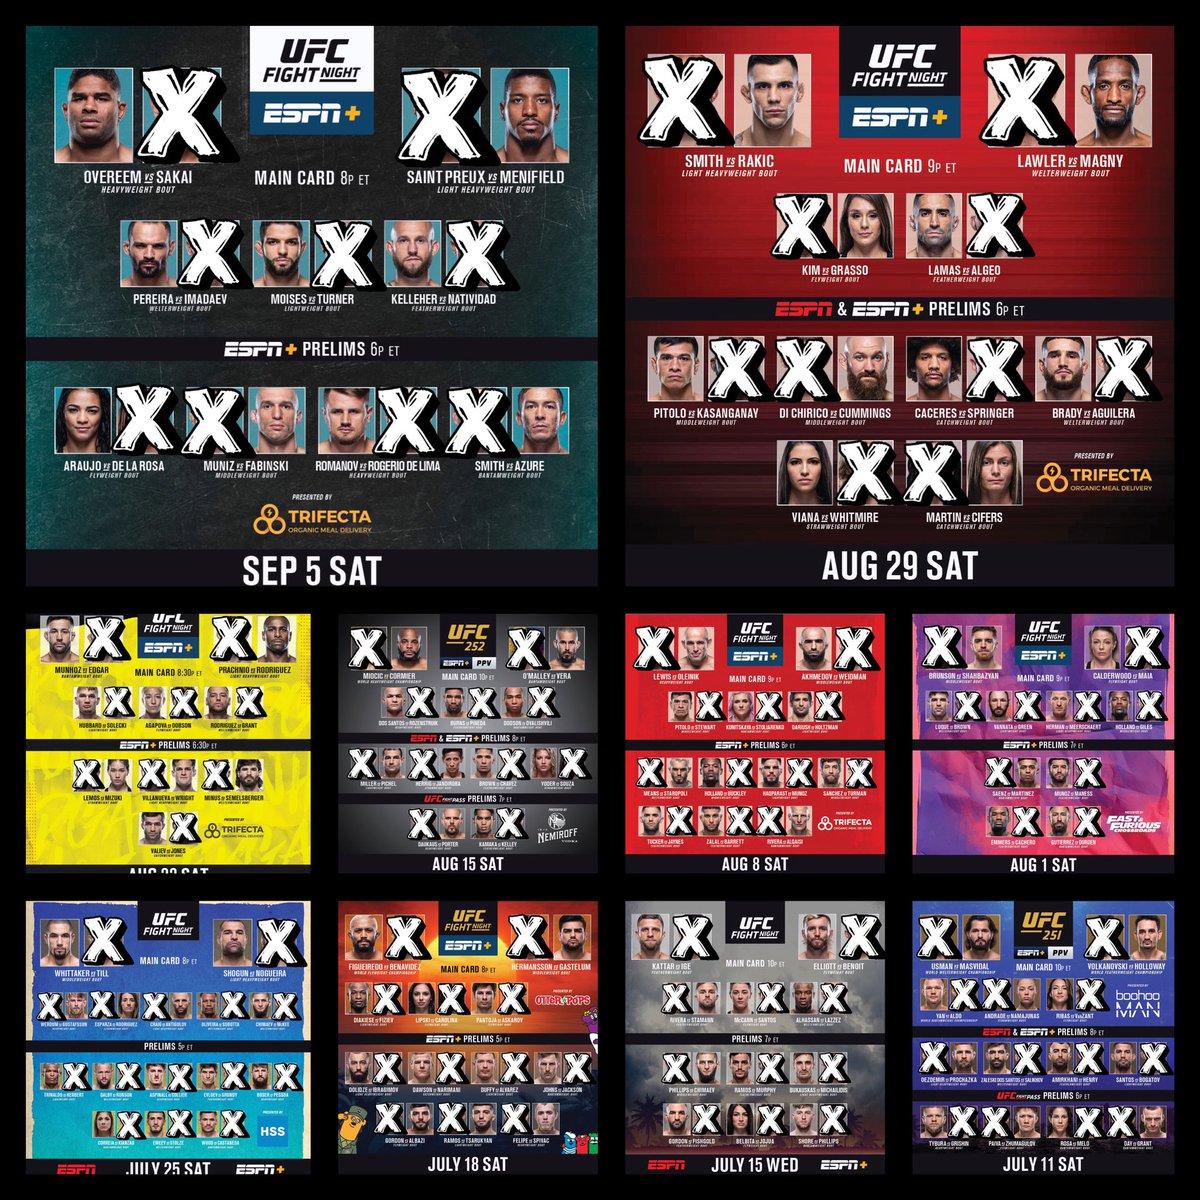 💰2020 #FightPick record:   • Overall: (174-113) | 60.63%  - Main Card: (74-64) | 53.62% - Prelims: (92-40) | 69.70% - Early Prelims: (8-9) | 47.06%   2️⃣ Draws:  • #UFCBrasilia  • #UFCVegas5  1️⃣ No Contest: #UFC247 https://t.co/MkReCf2xxv